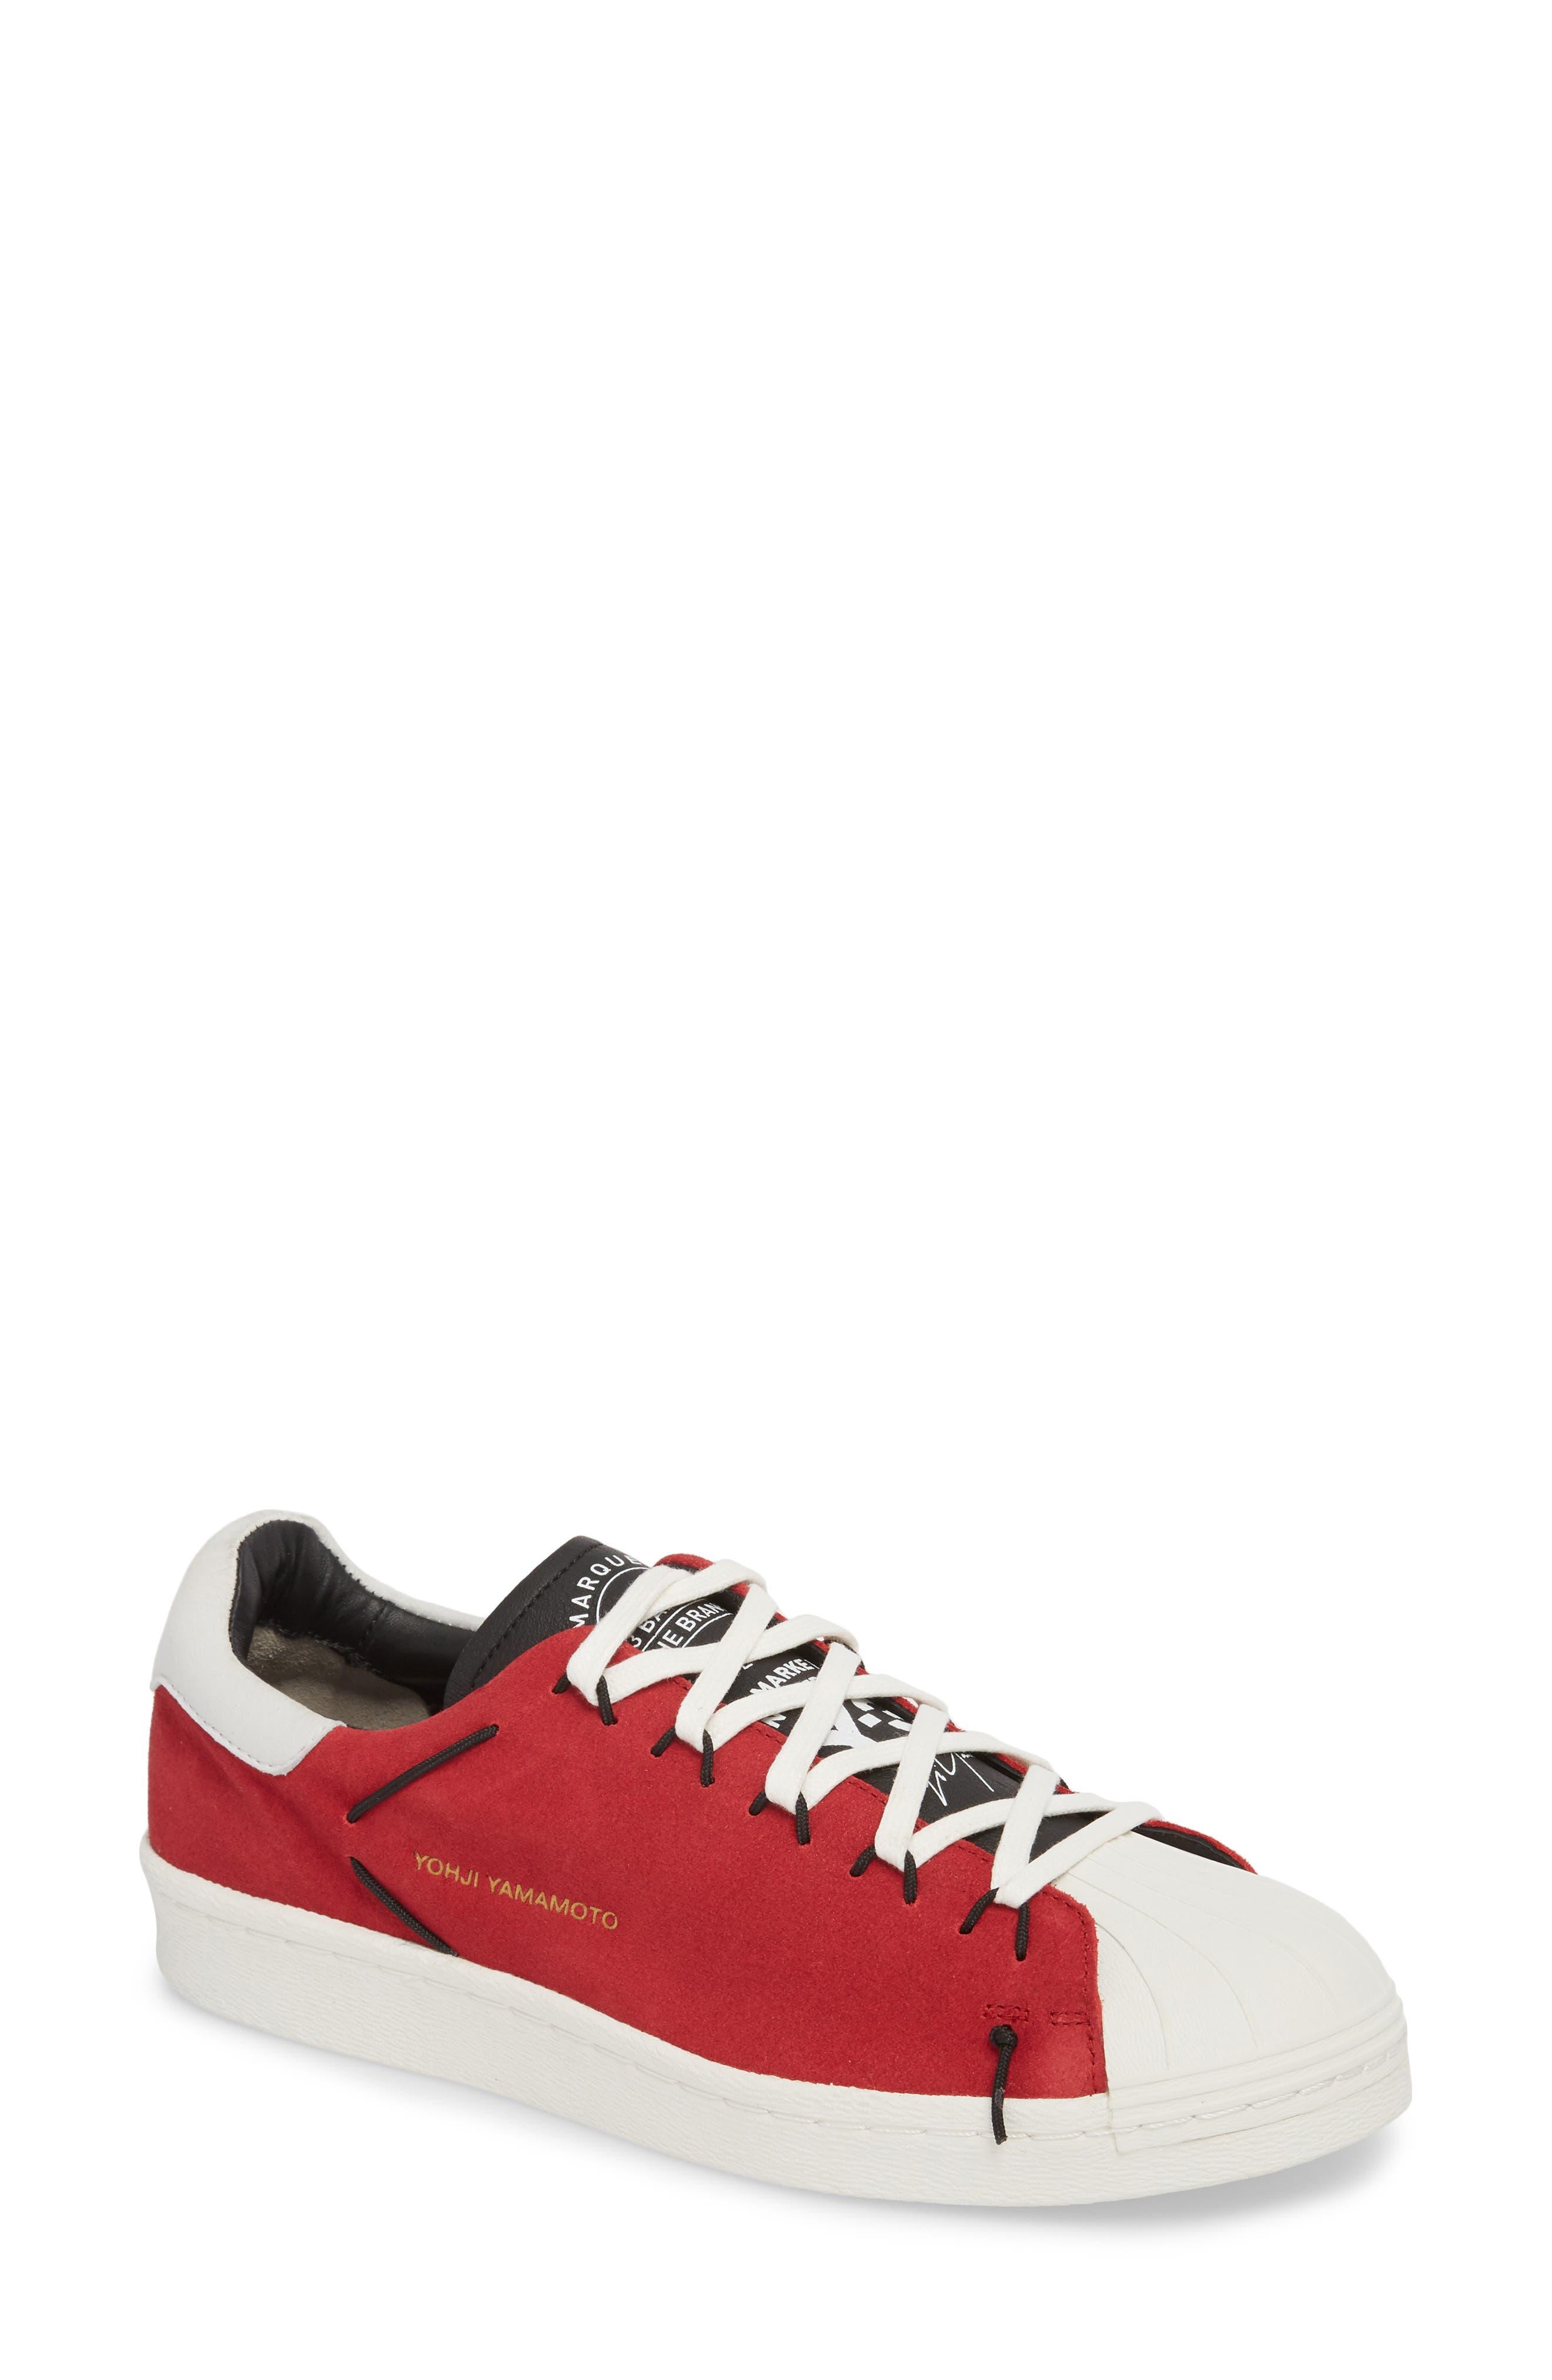 x adidas Super Knot Low Top Sneaker,                             Main thumbnail 1, color,                             602